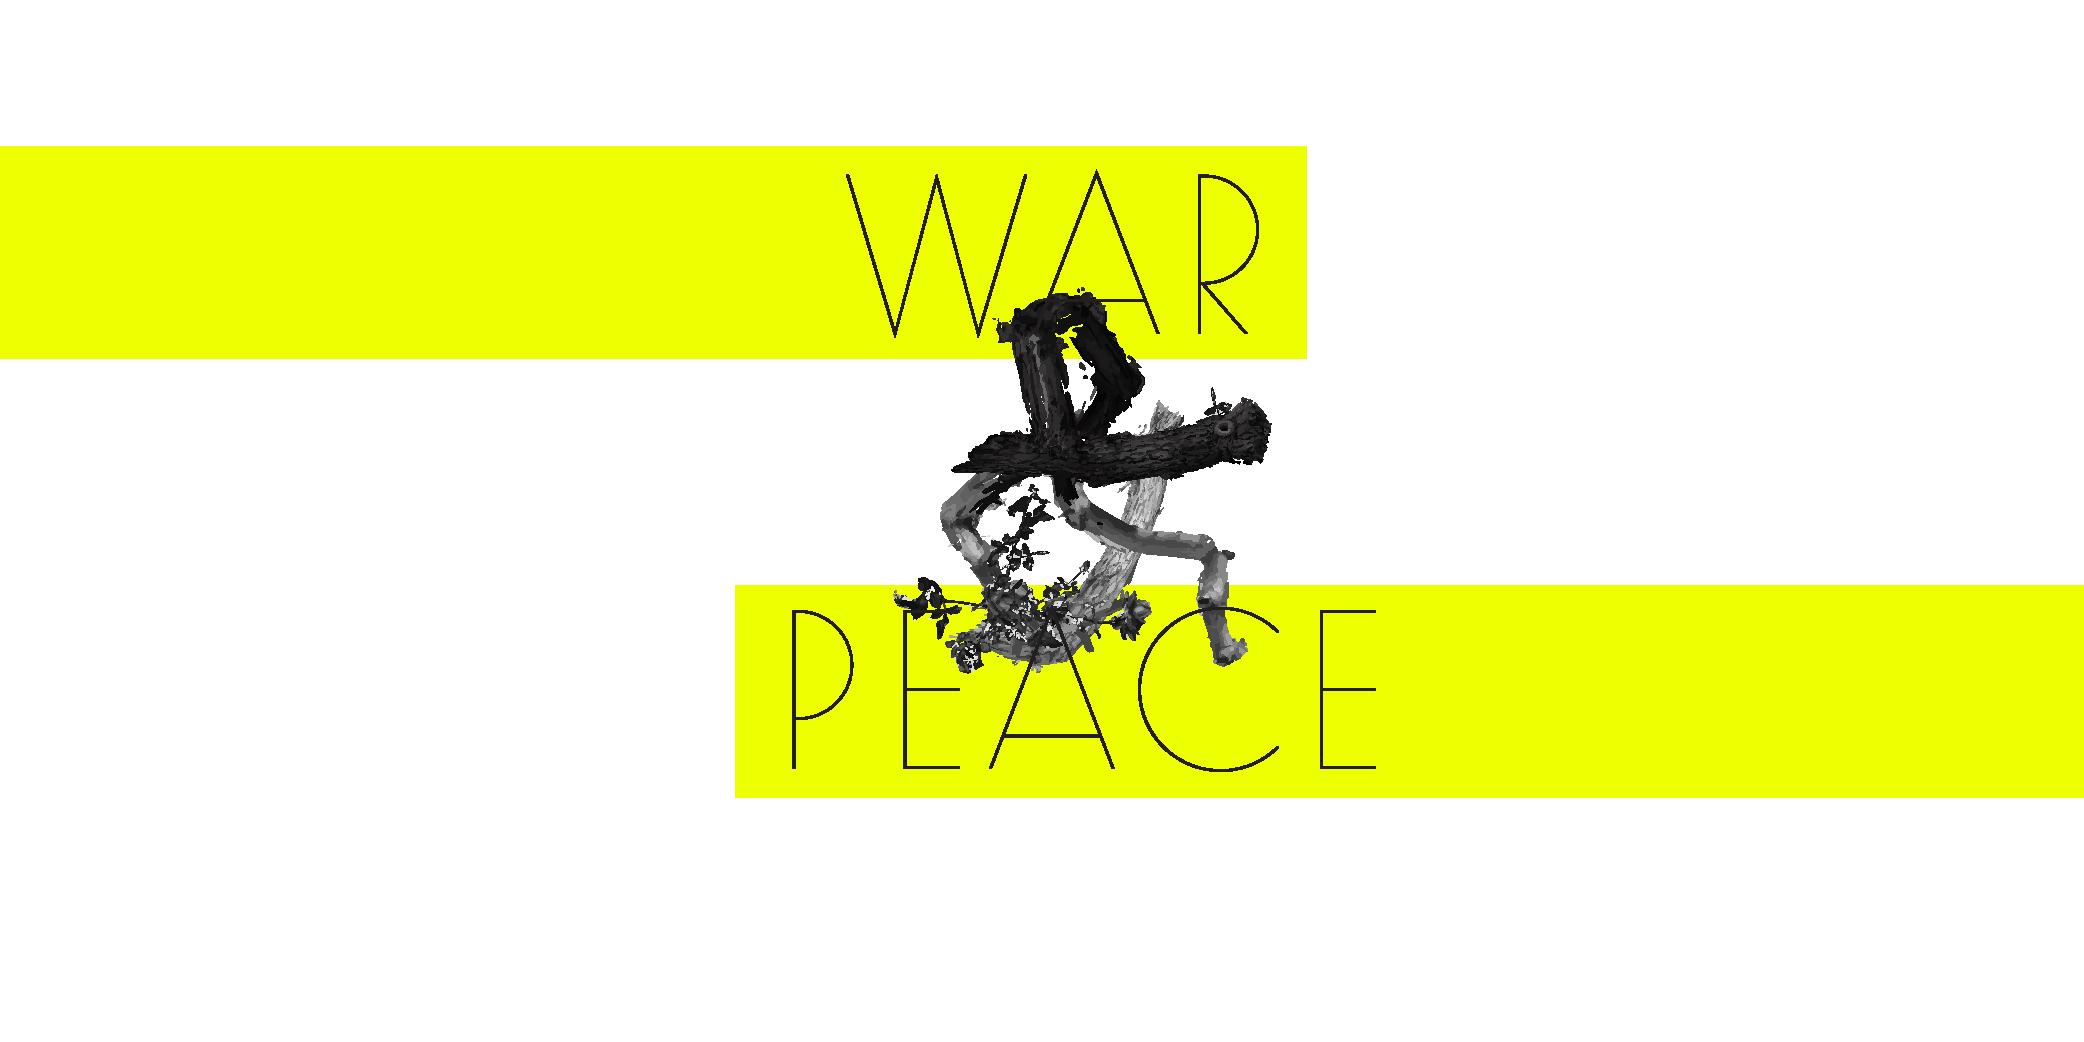 laba-journal-war-peace-150dp-01.png